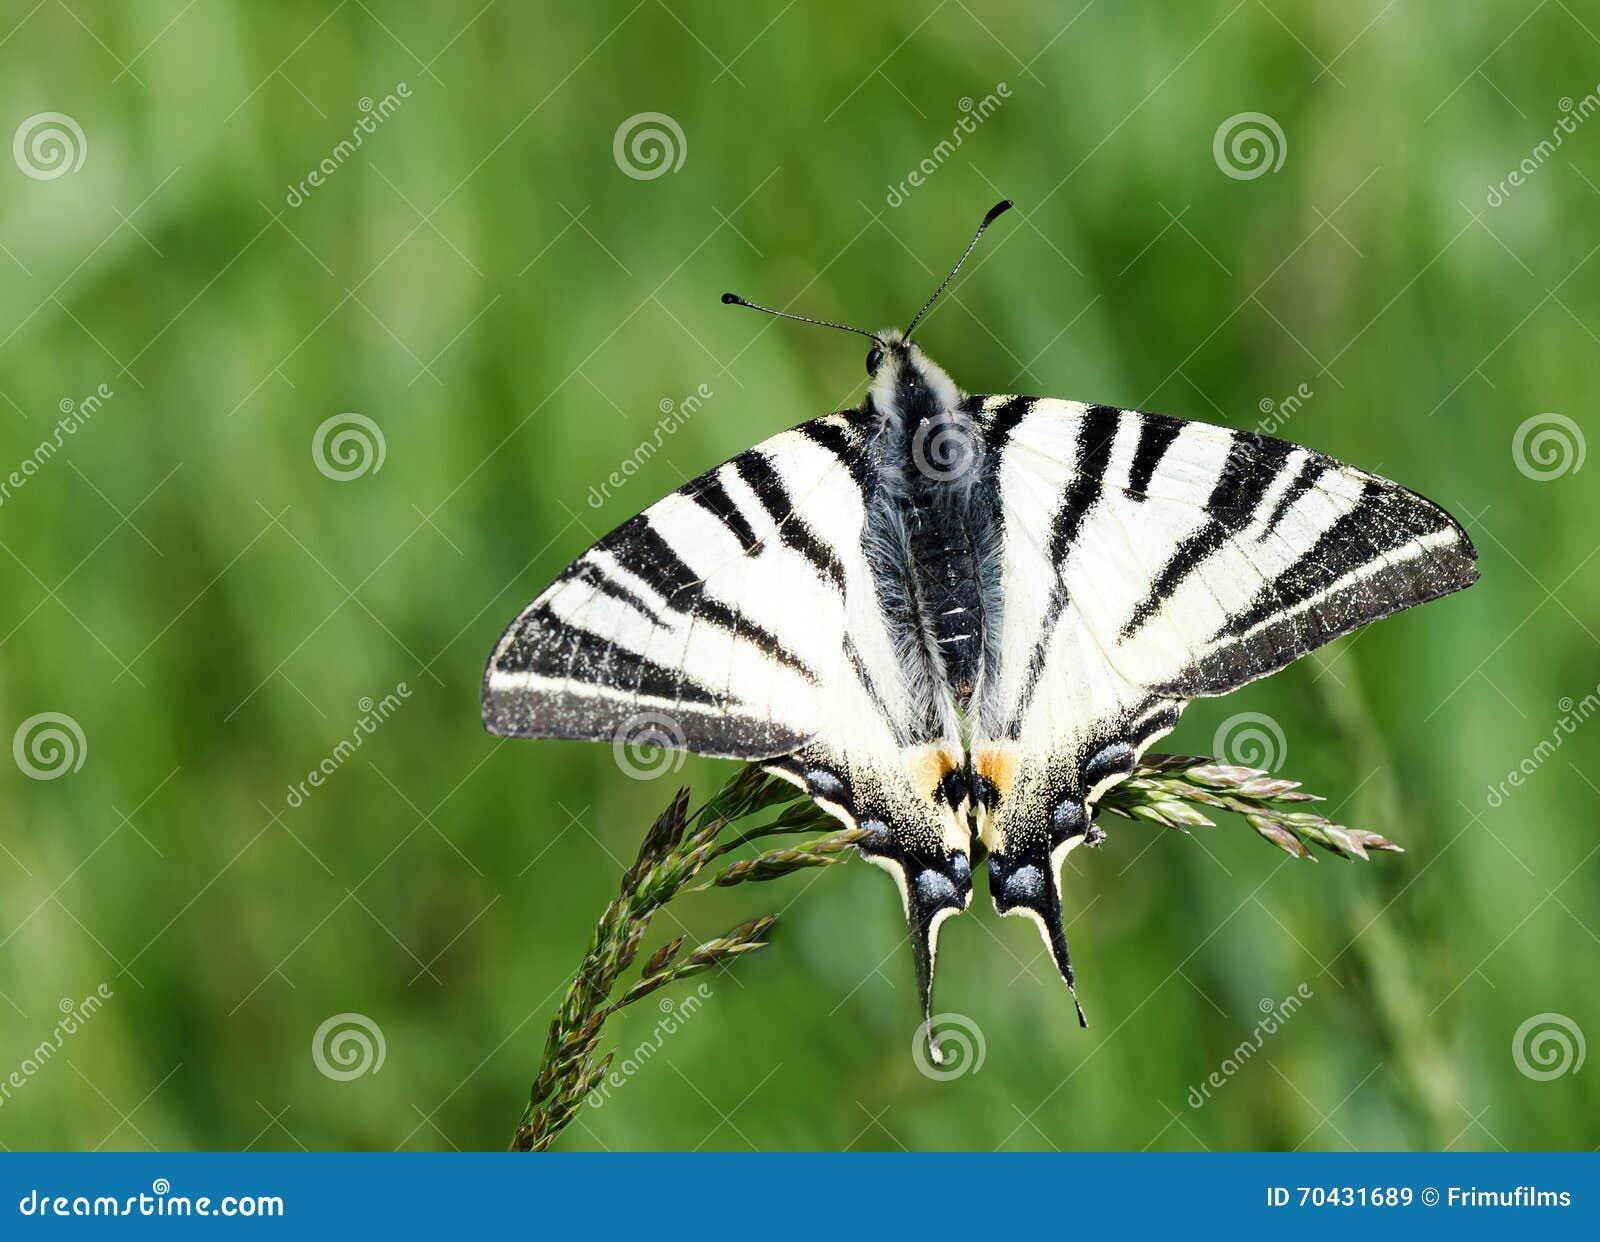 beau papillon noir et blanc image stock image du animal fond 70431689. Black Bedroom Furniture Sets. Home Design Ideas